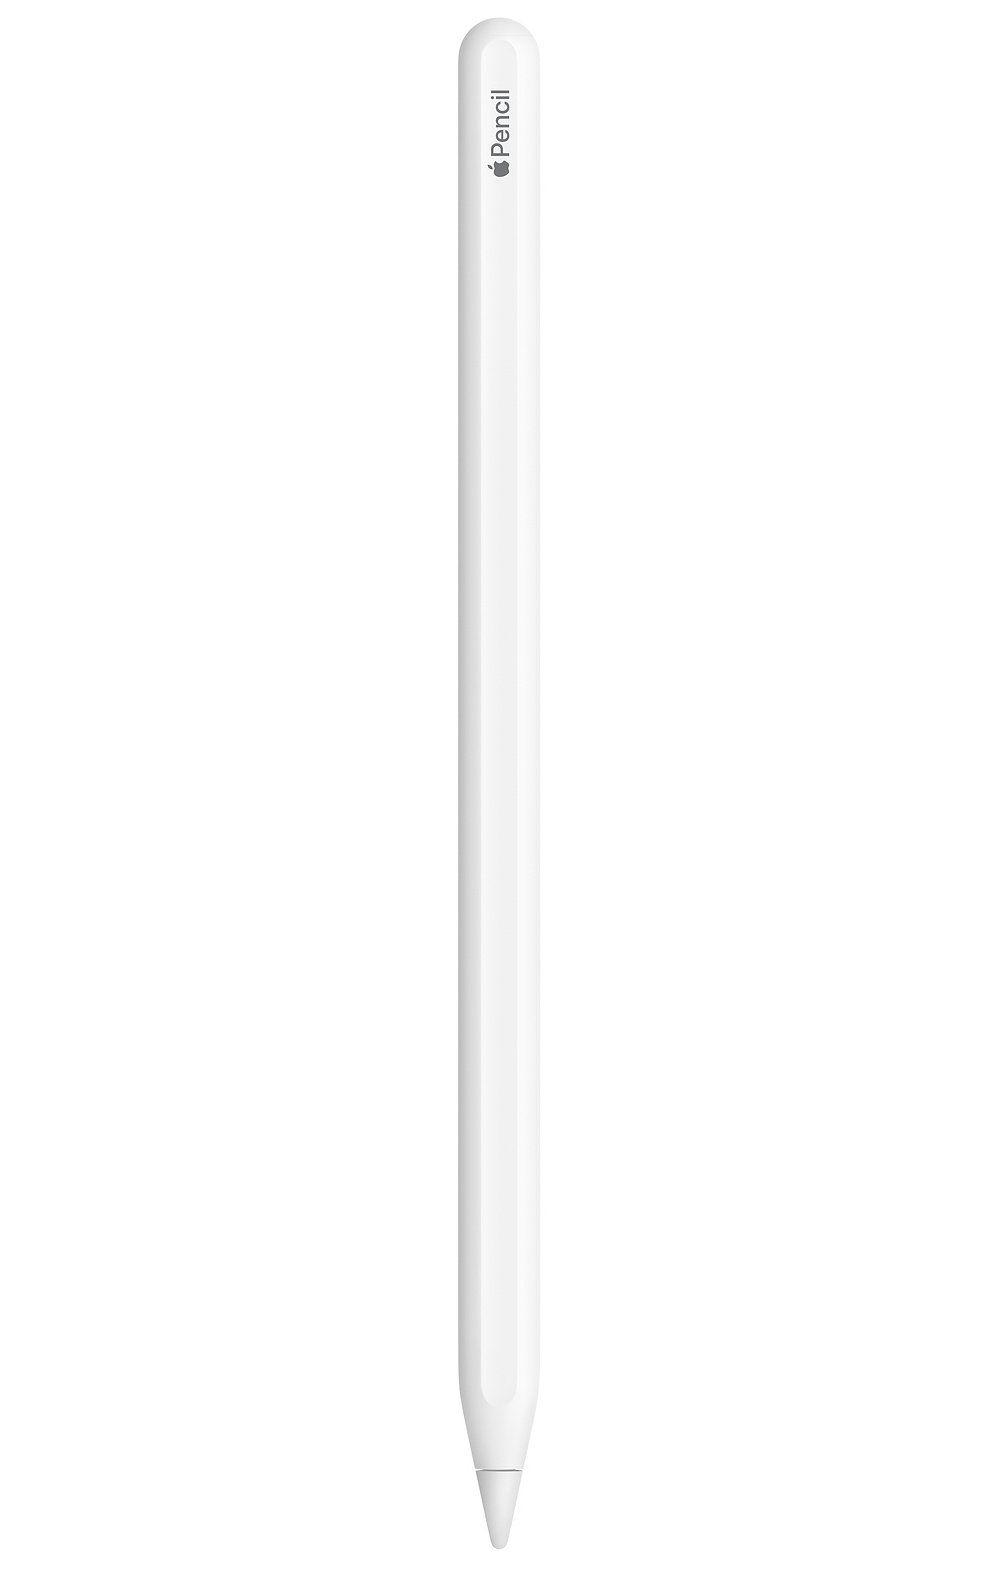 Apple Pencil 2nd Generation in 2020 Apple pencil, Apple